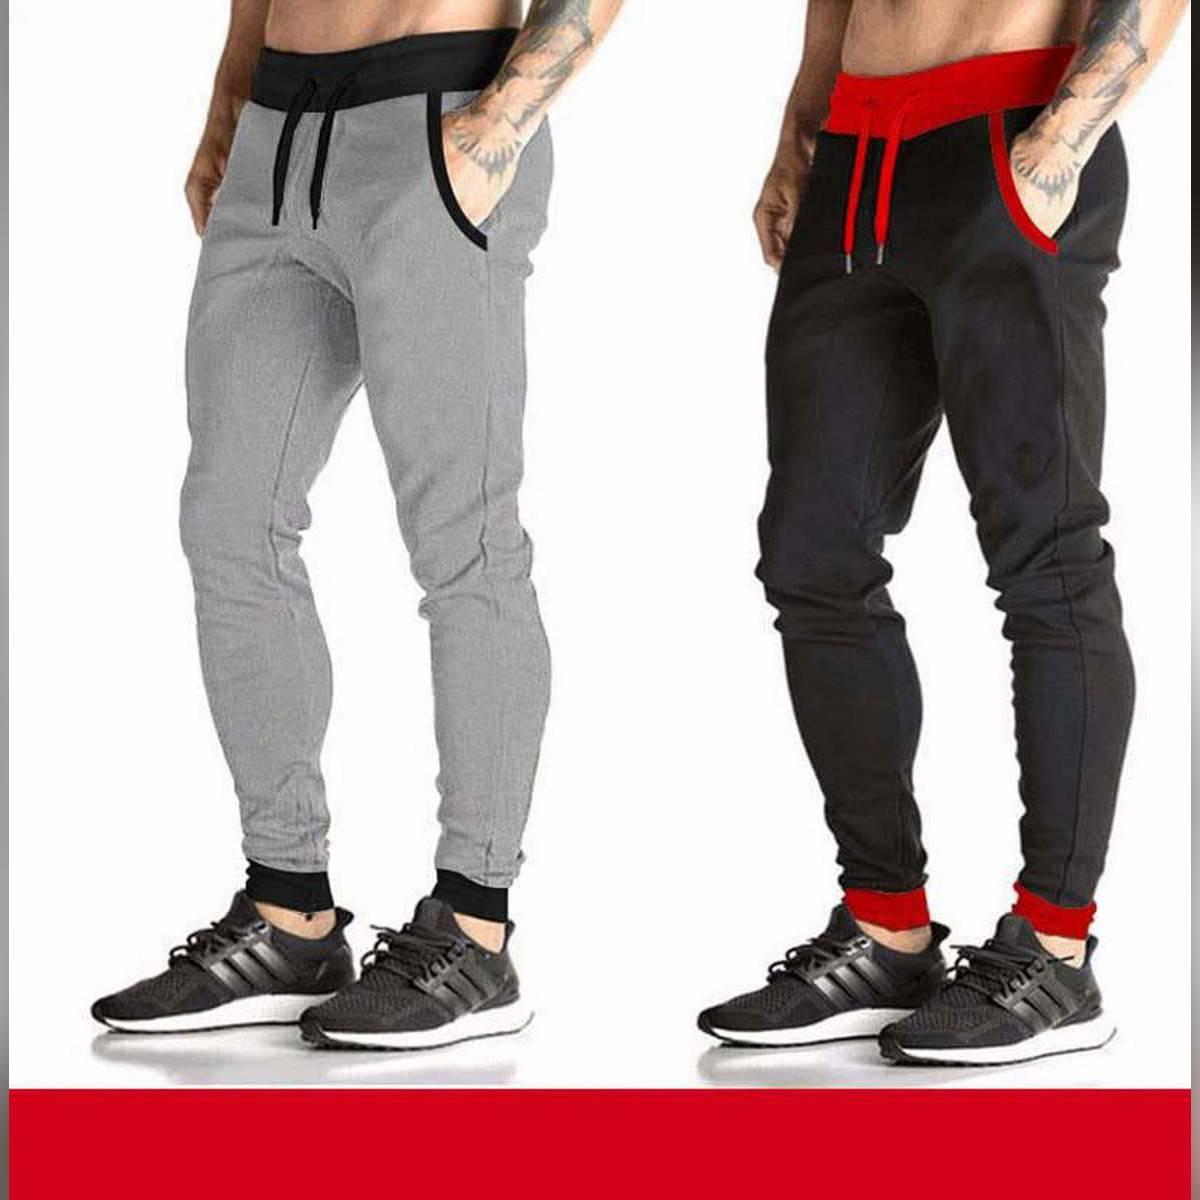 Pack Of 2 Printed Style Trouser Men Pajamas